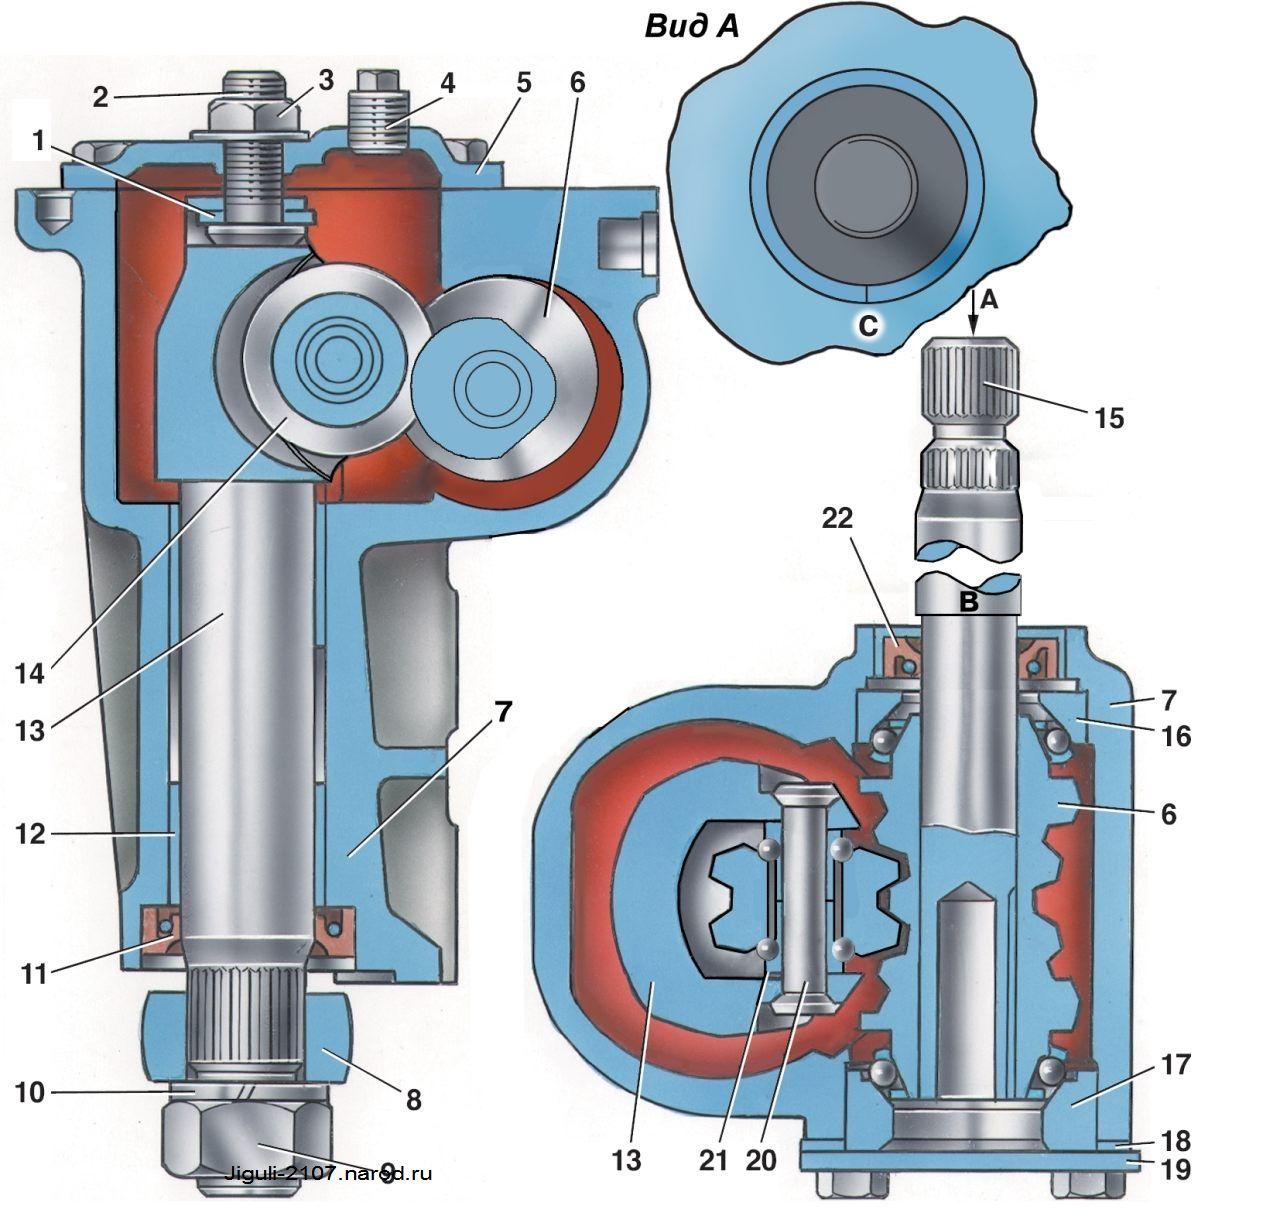 Установка и снятие рулевого механизма Ваз 2107, Ваз 2105, Ваз 2104, Лада Жигули, Классика.